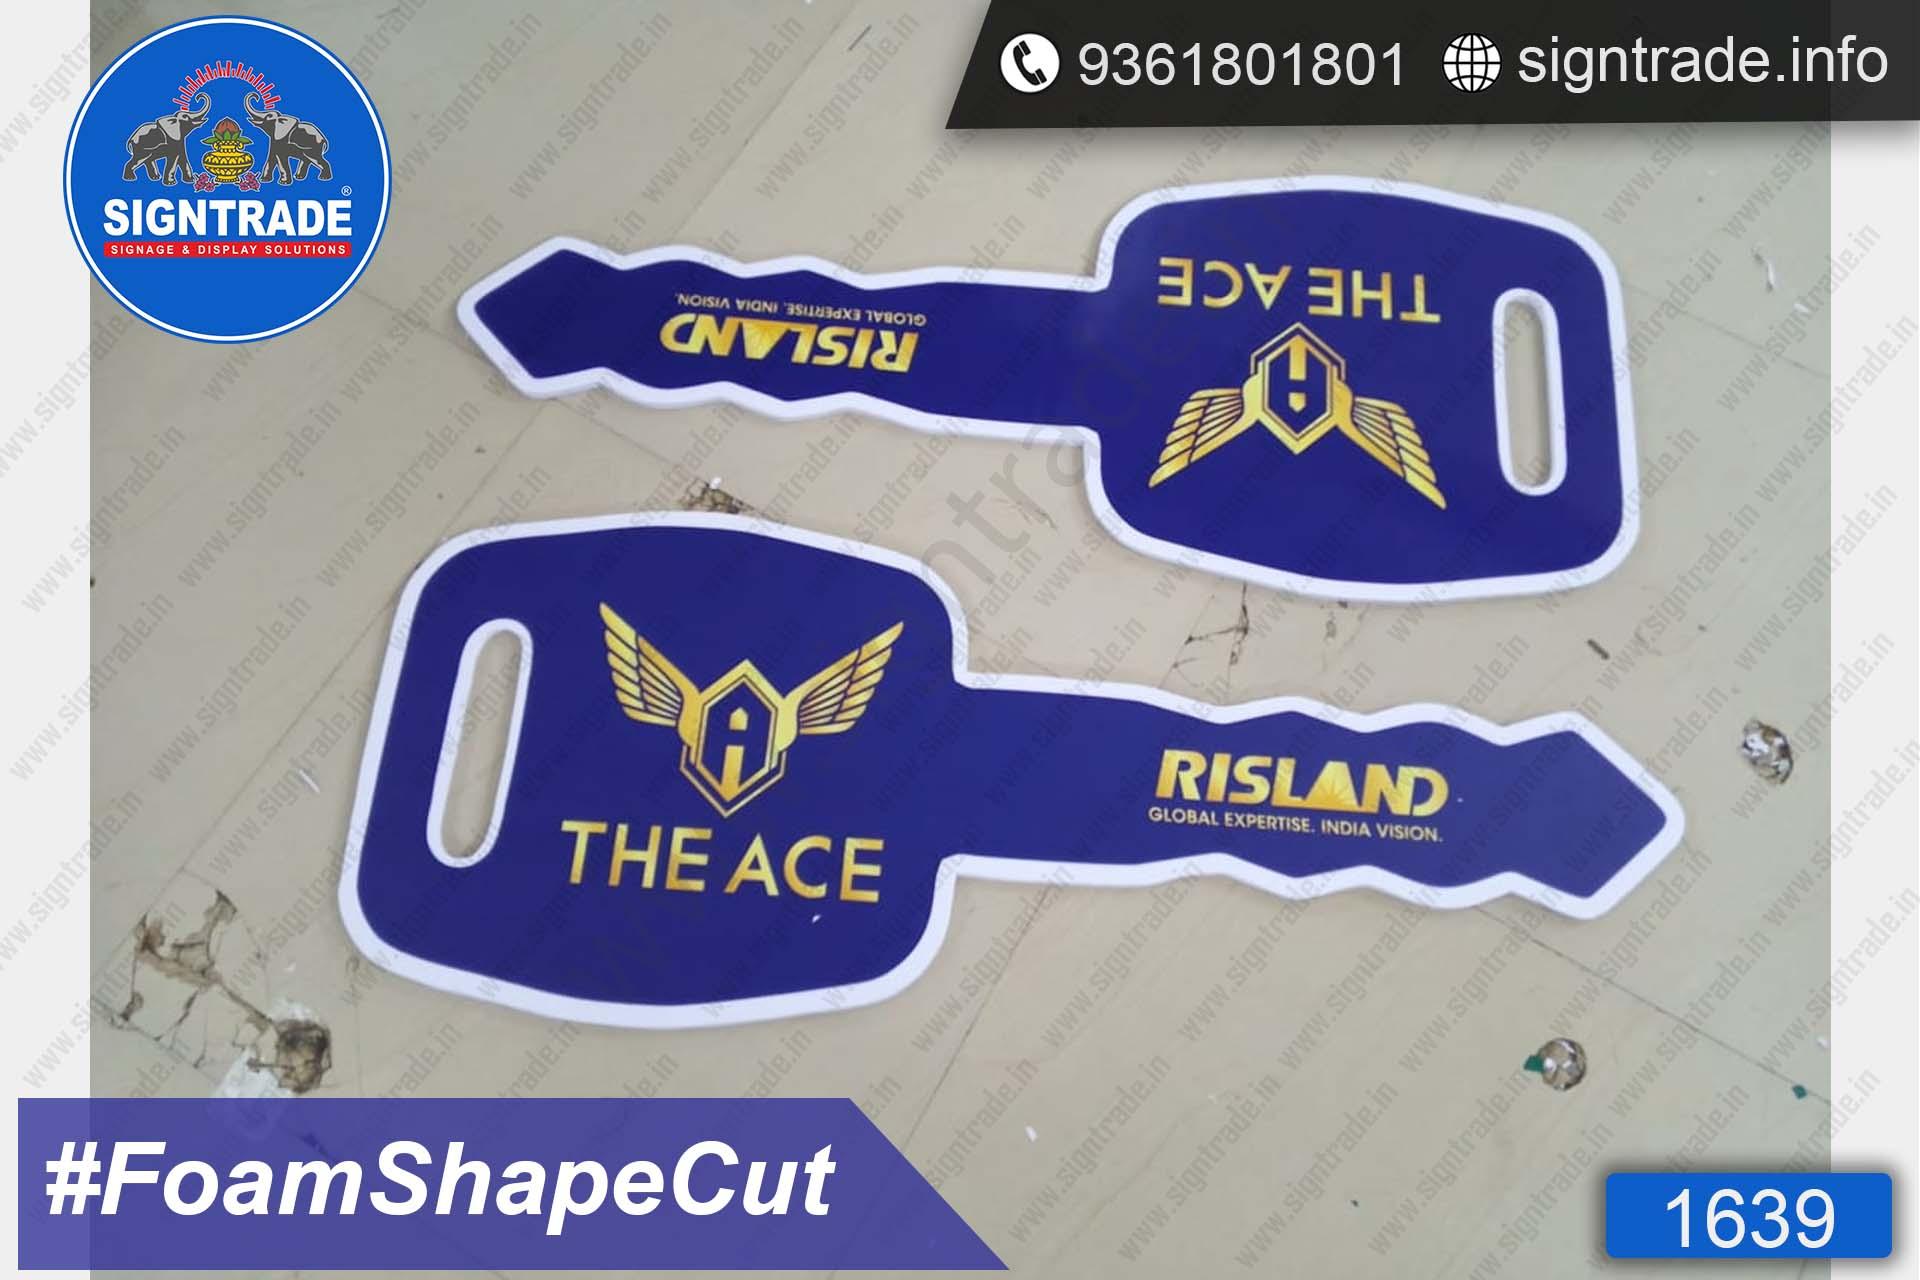 The Ace - Chennai - SIGNTRADE - Foam Board Shape Cut - Digital Printing Services in Chennai